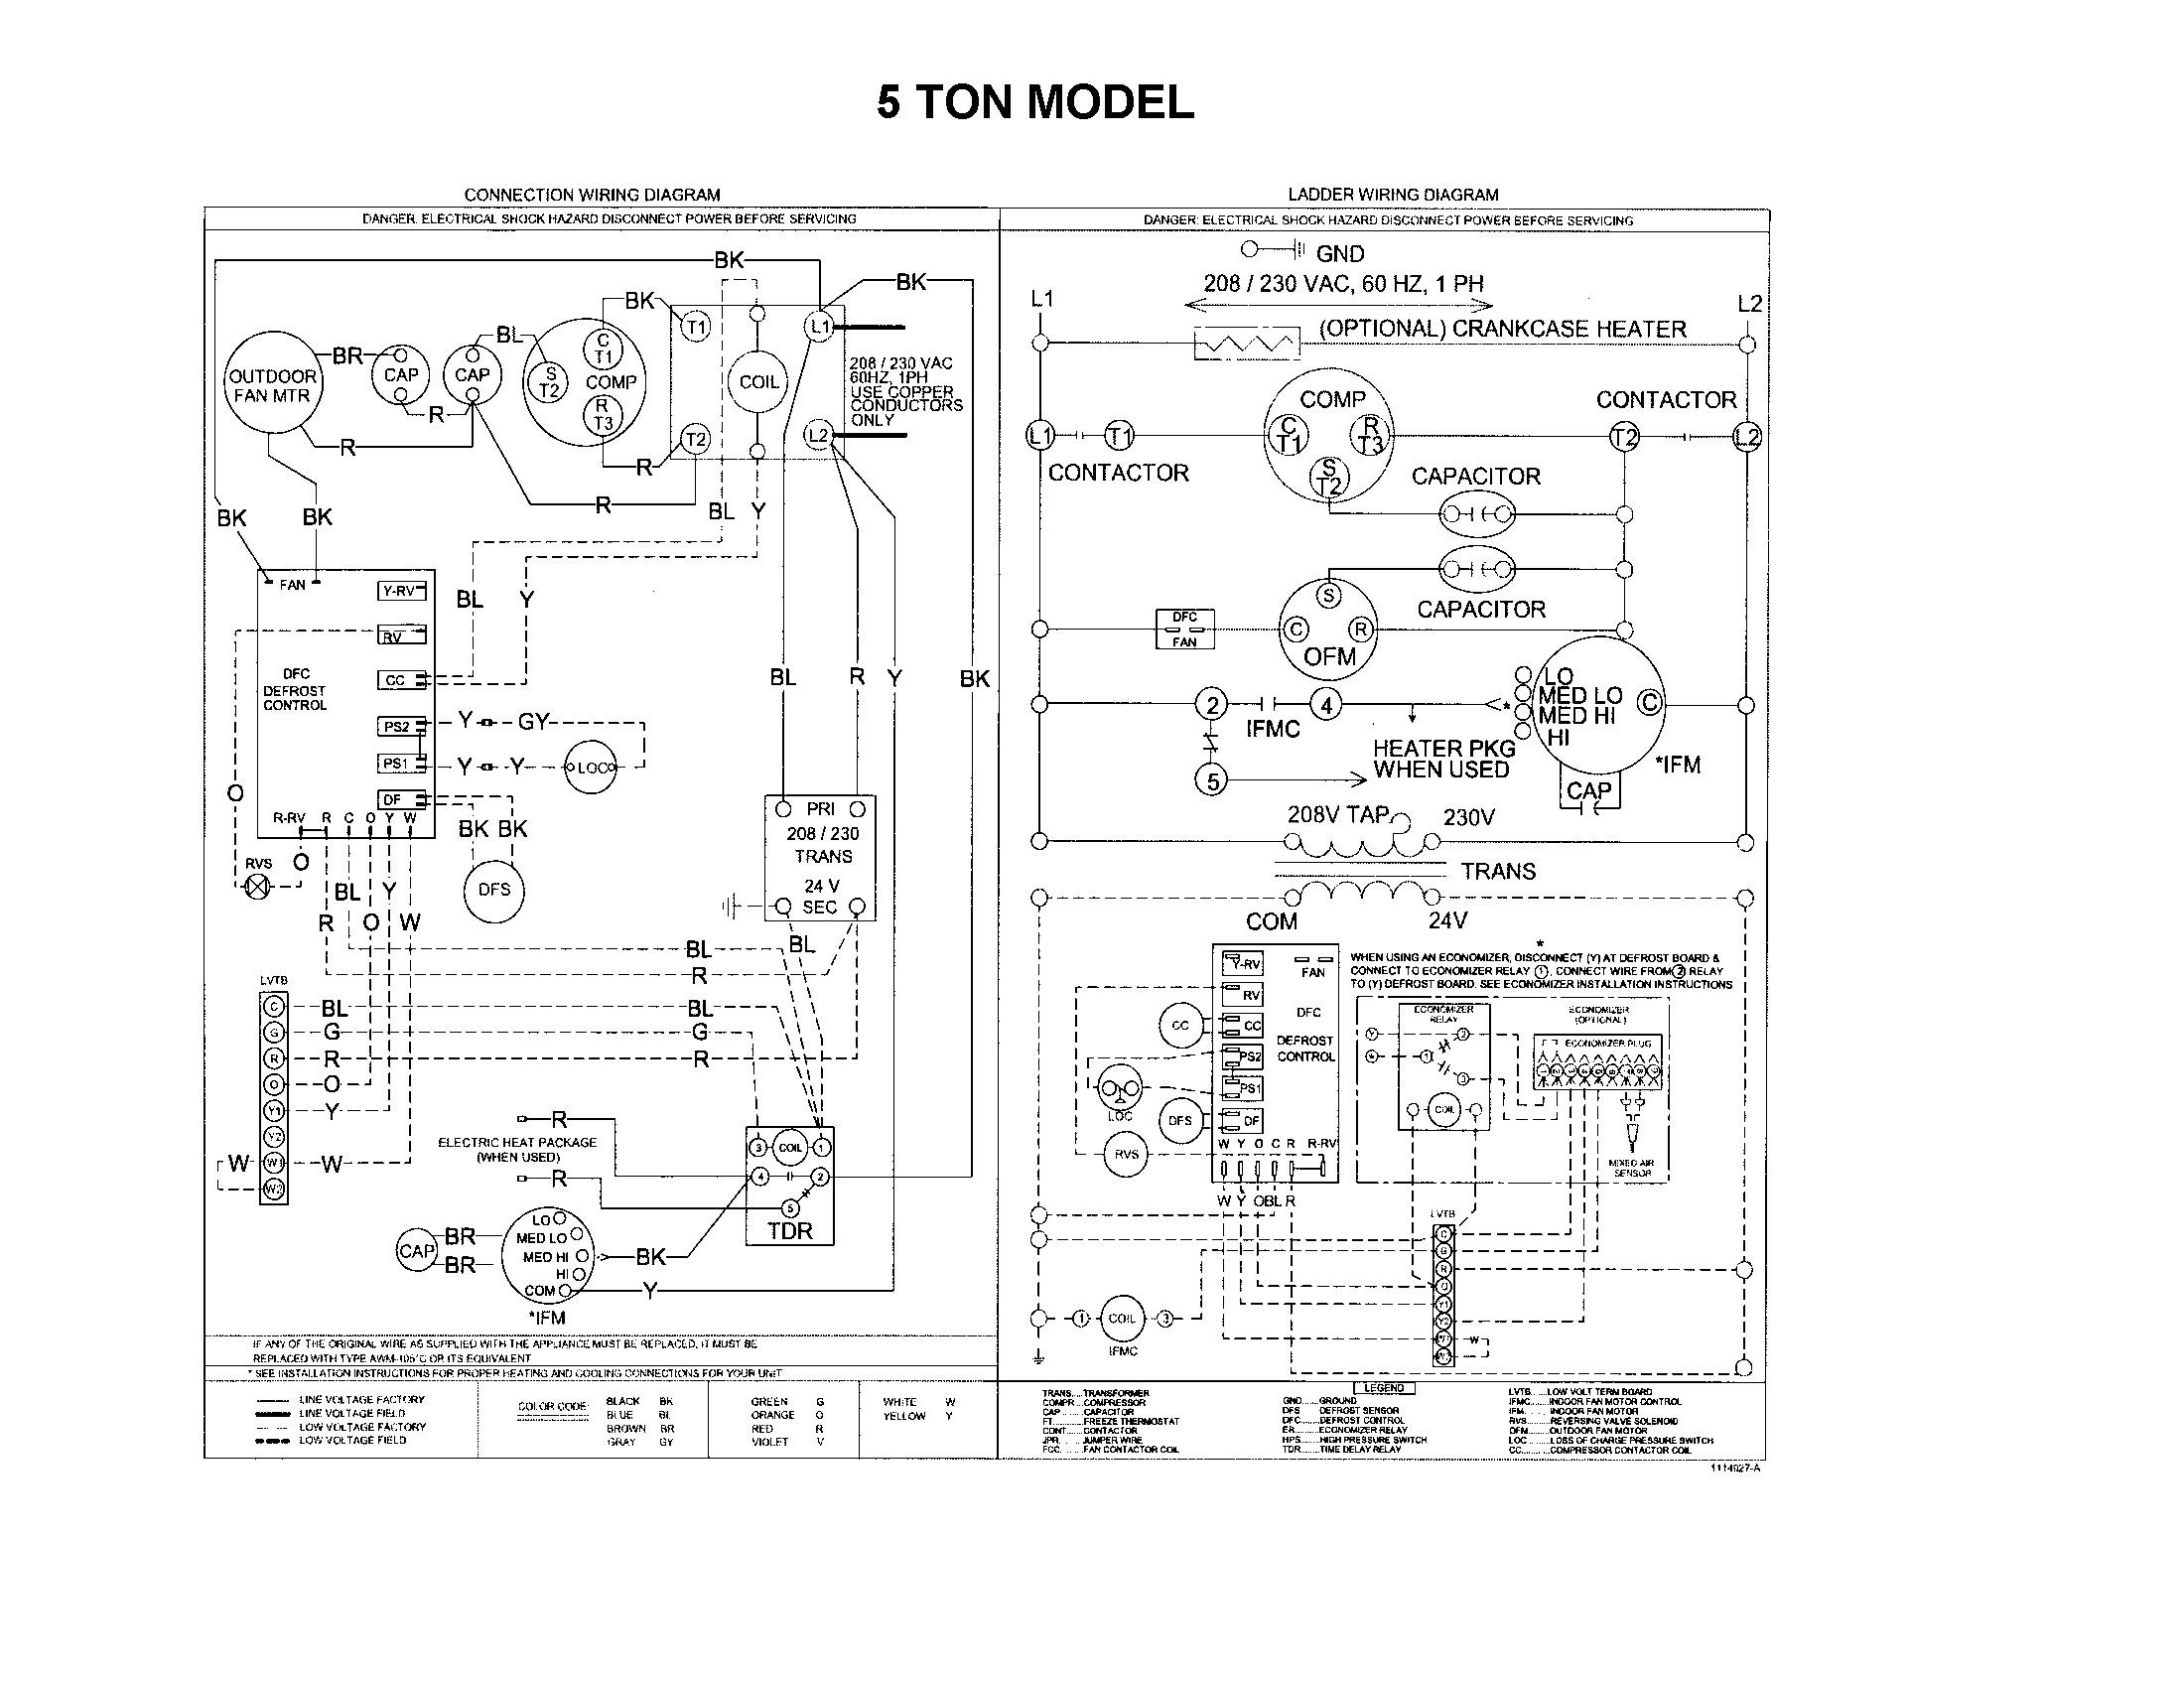 2200x1696 goodman heat pump package unit wiring diagram best of goodman heat